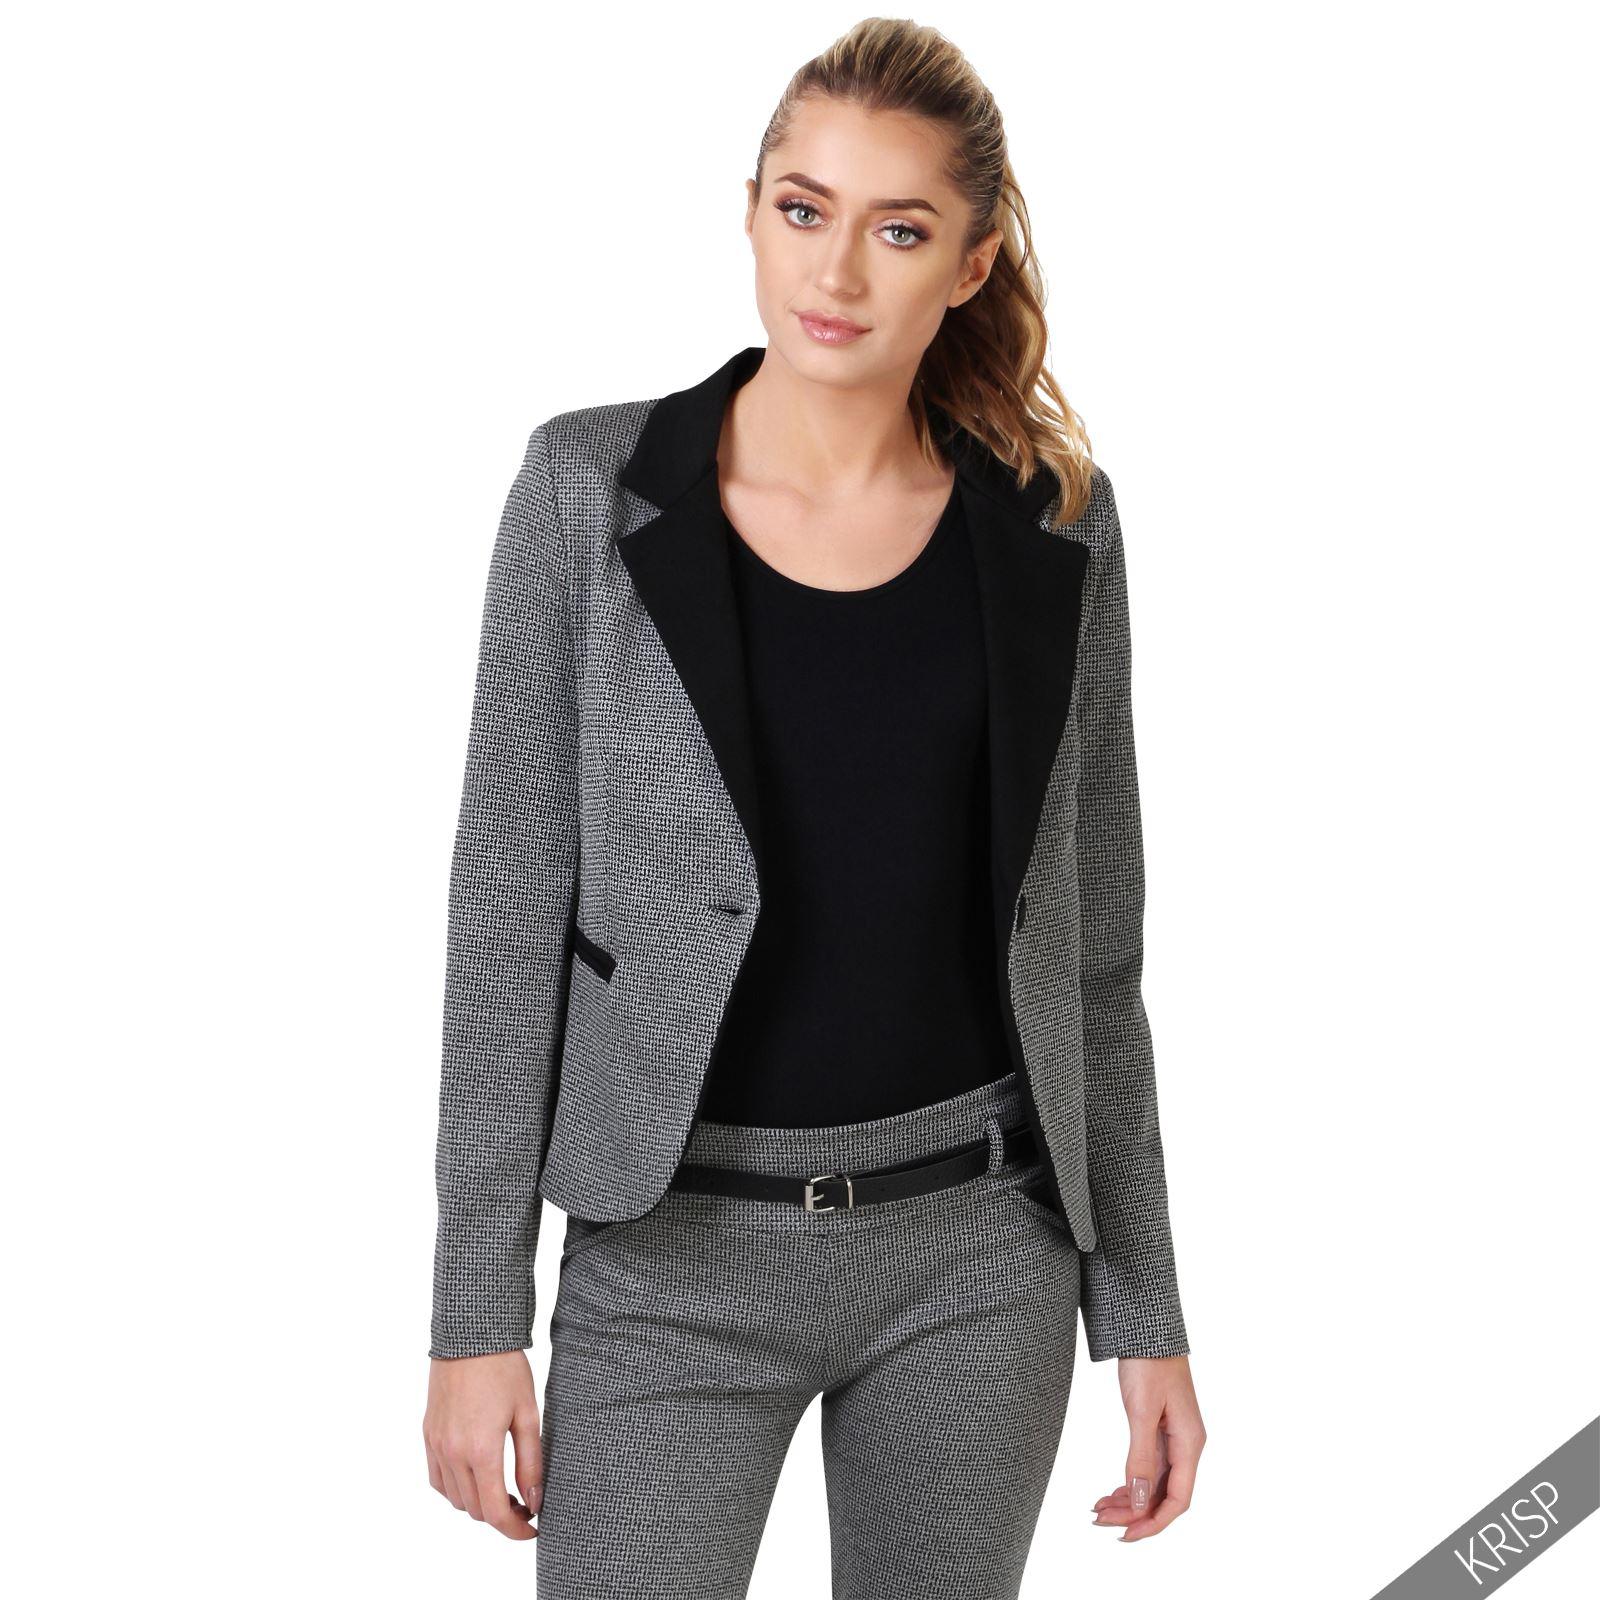 Ladies Womens Fashion Trousers Blazer Jacket Suit 2 Piece ...